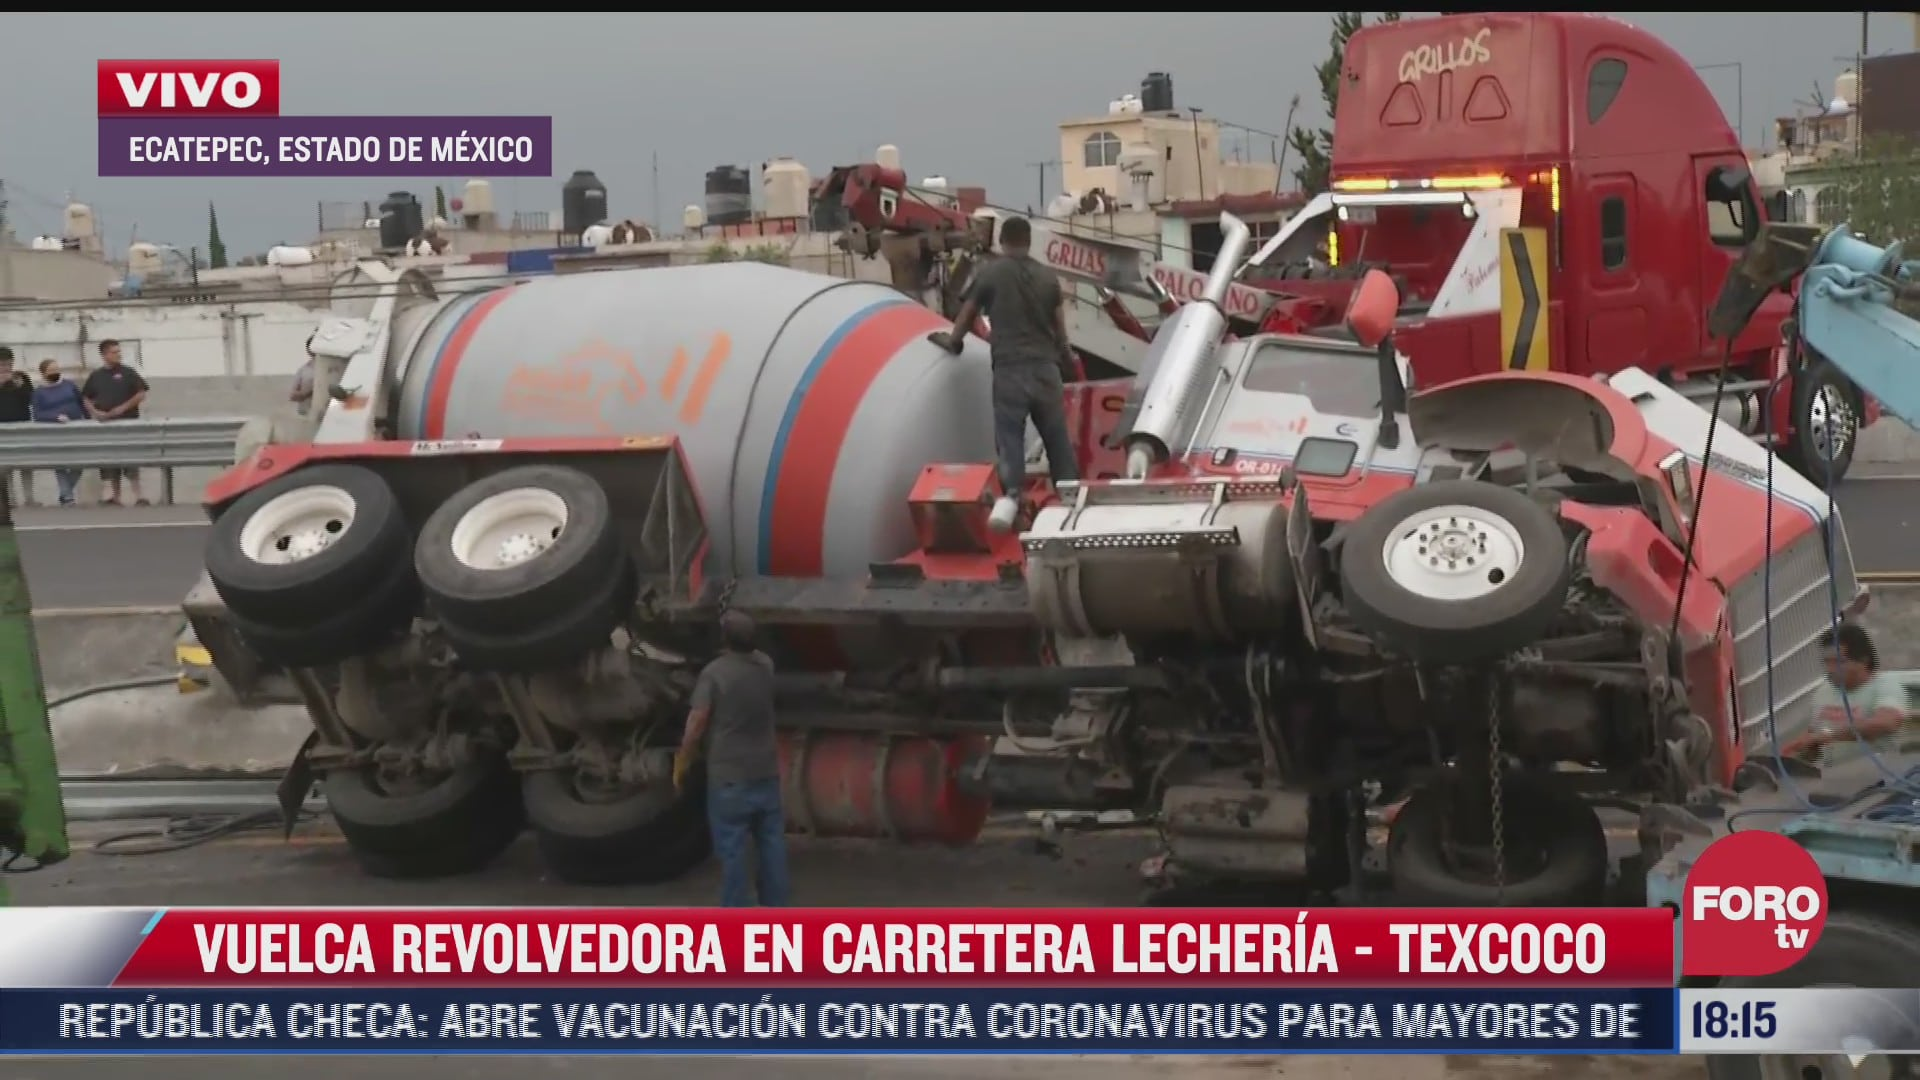 vuelca revolvedora en carretera lecheria texcoco